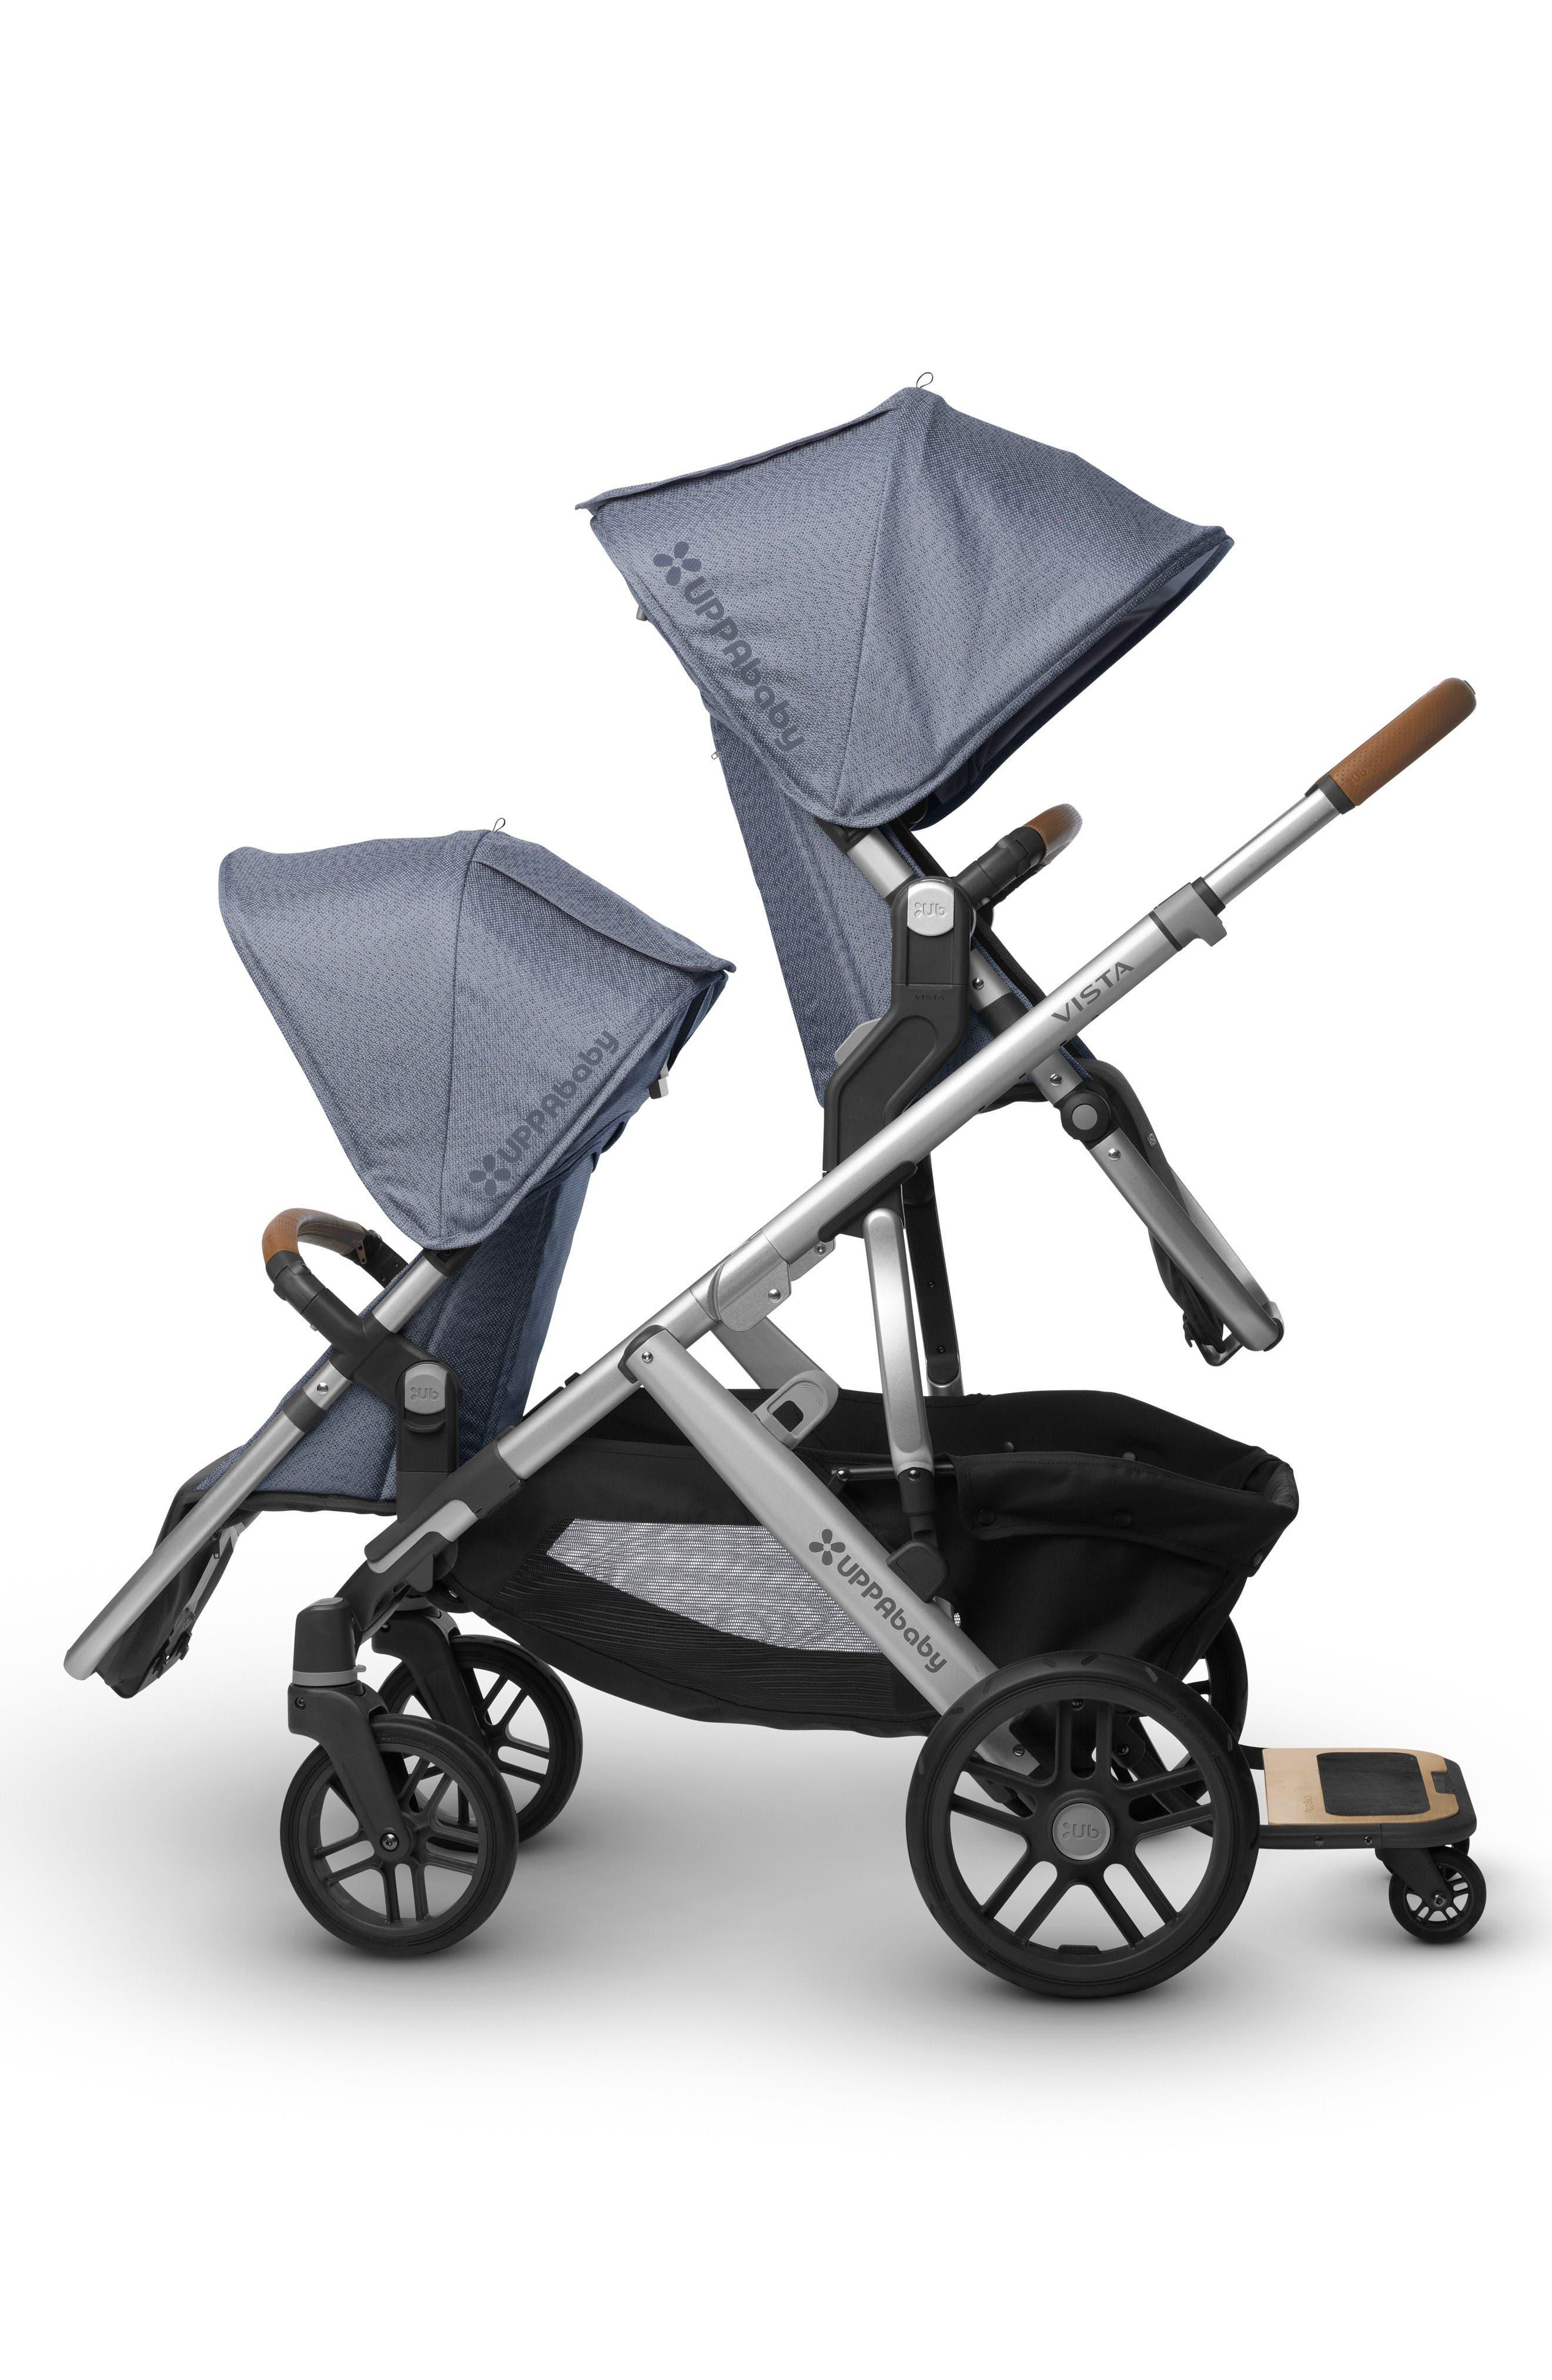 2017 VISTA Henry Aluminum Frame Convertible Stroller with Bassinet & Toddler Seat,                             Alternate thumbnail 7, color,                             Blue Marl